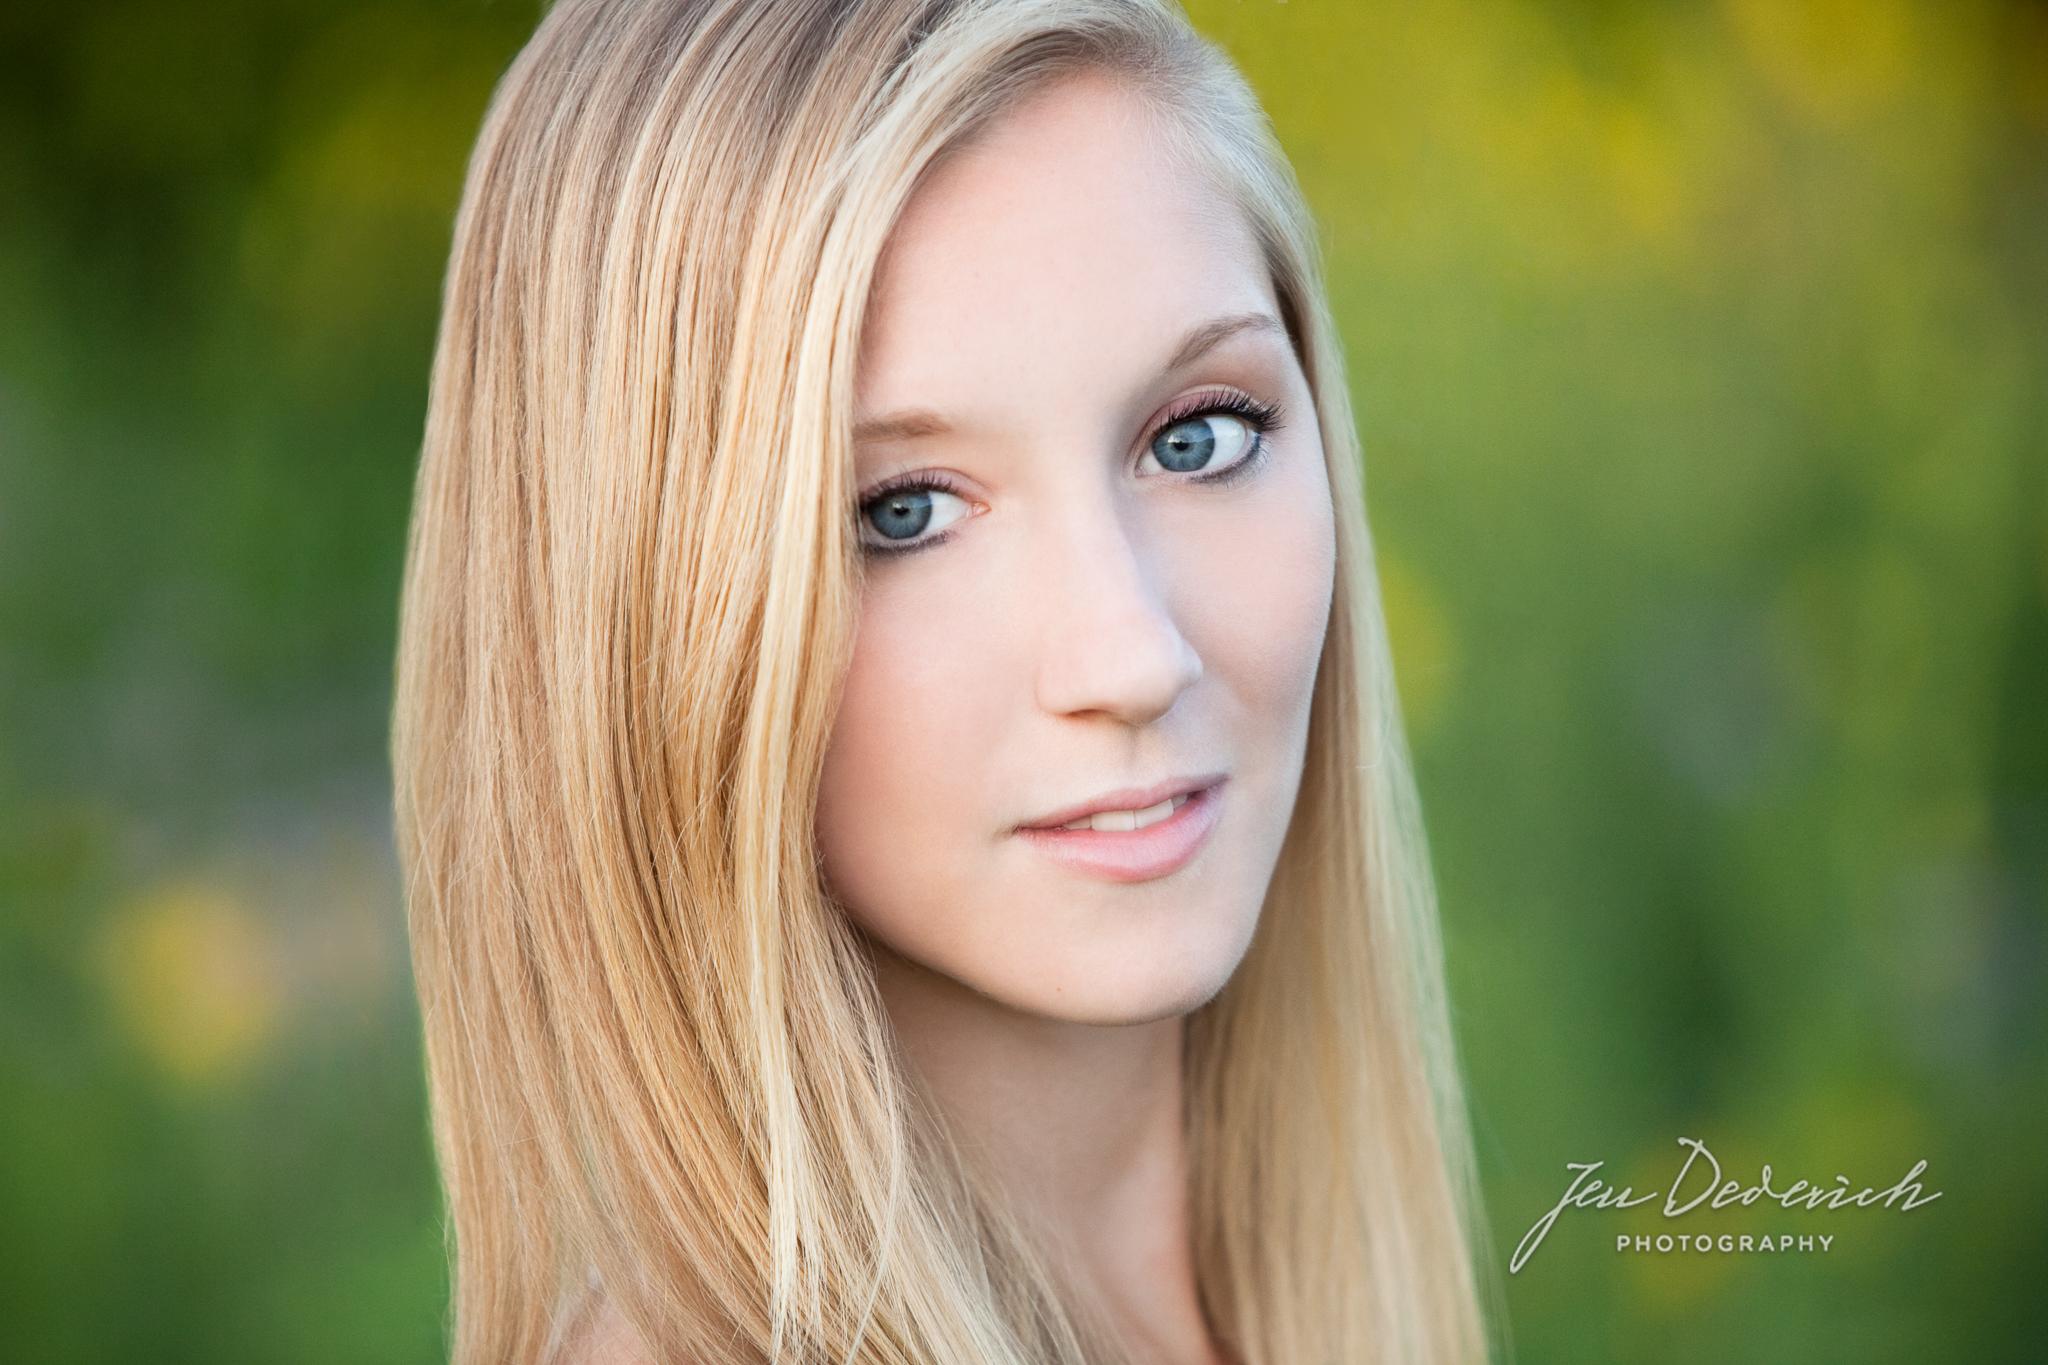 Senior_Madison WI_Jen Dederich Photography_007.jpg